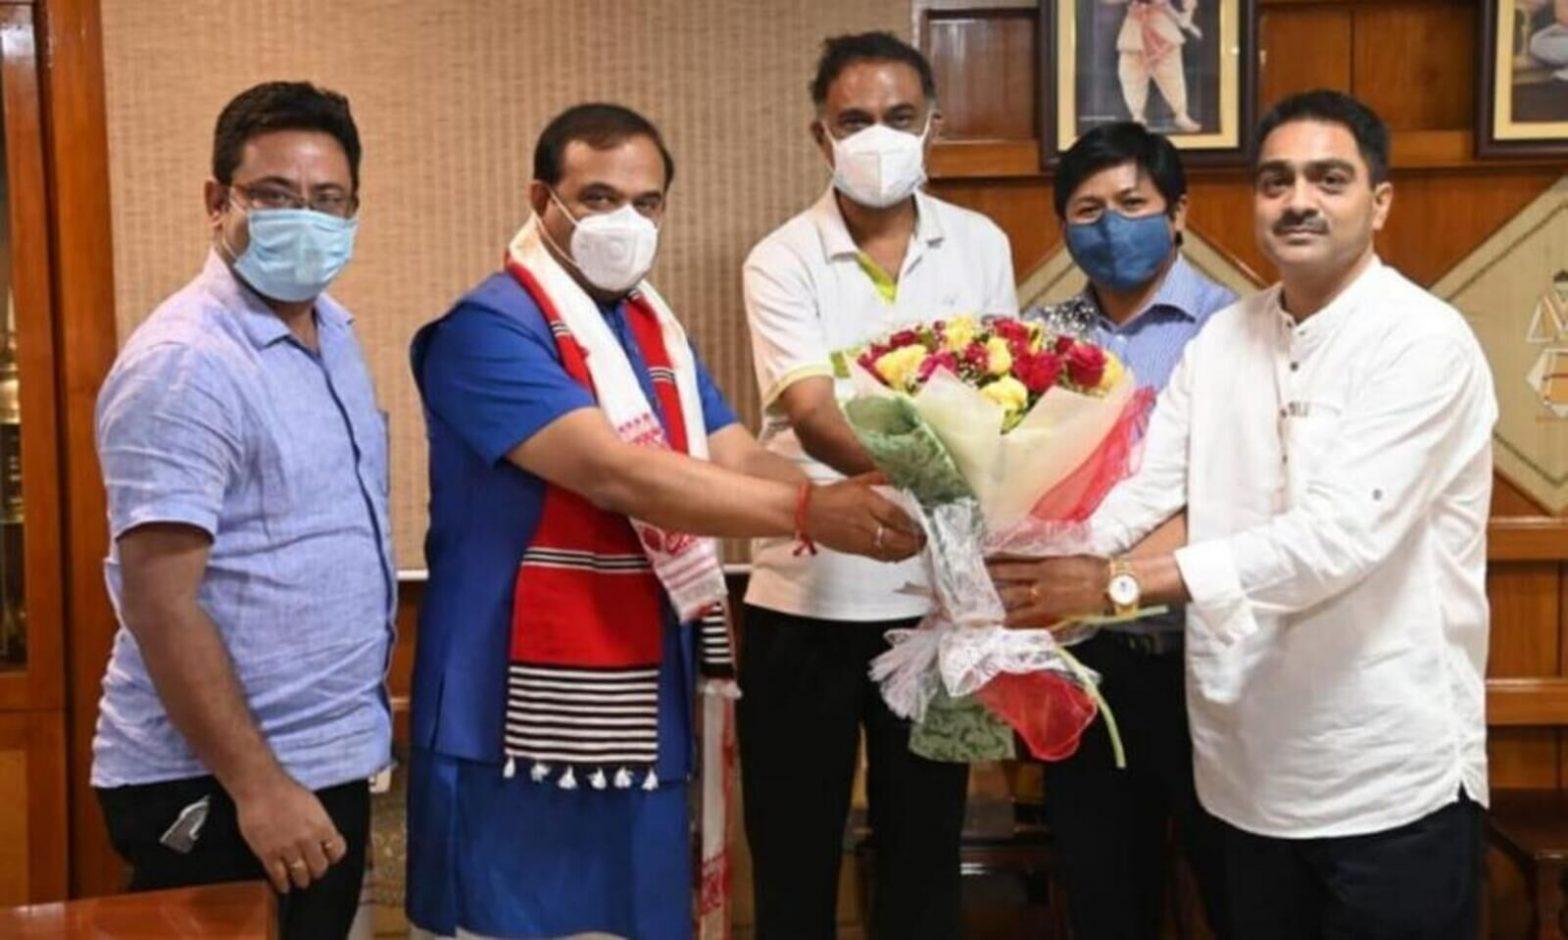 Himanta Biswa Sarma elected to BWF Council | ഹിമാന്ത ബിശ്വ ശർമ്മ ബിഡബ്ല്യുഎഫ് കൗൺസിലിലേക്ക് തിരഞ്ഞെടുക്കപ്പെട്ടു_40.1